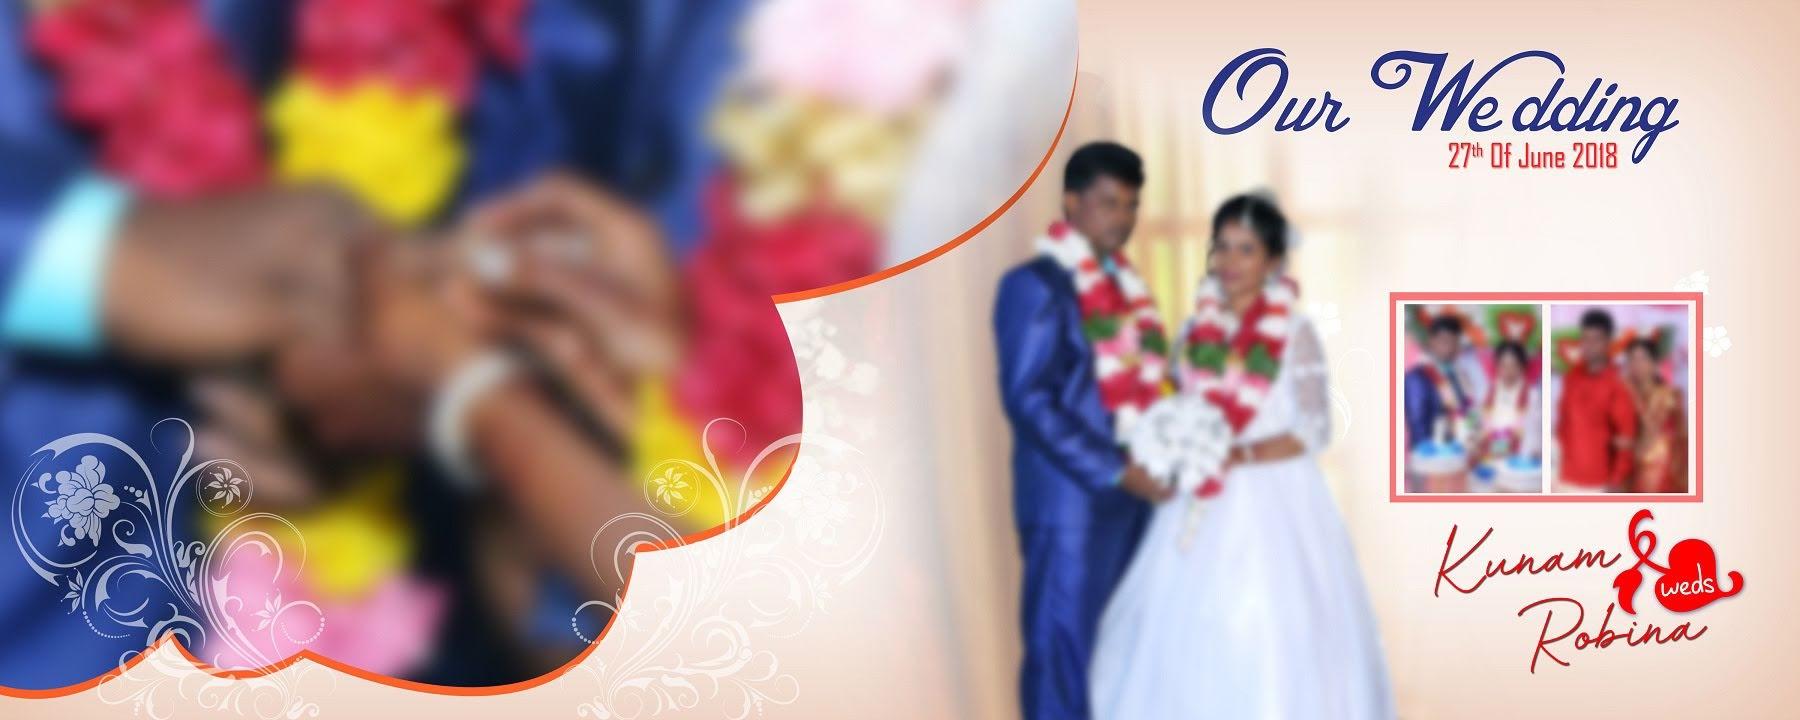 Wedding Album JKD27619